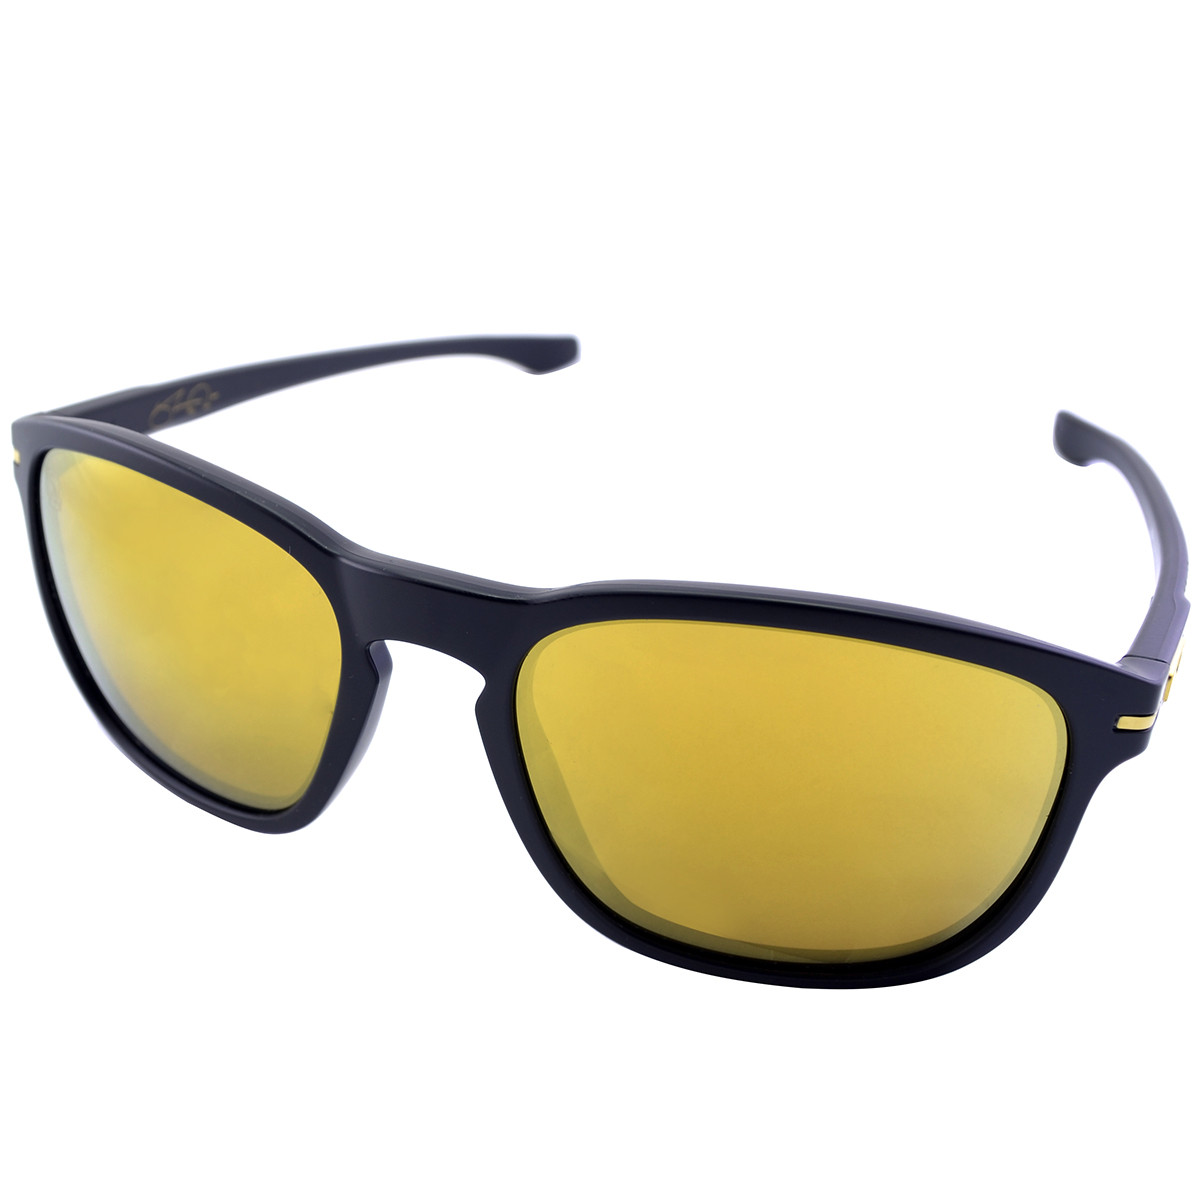 004edf1d8d19e Óculos Oakley Enduro Shaun White Signature Series Matte Black Lente 24k  Iridium ref OO9223-